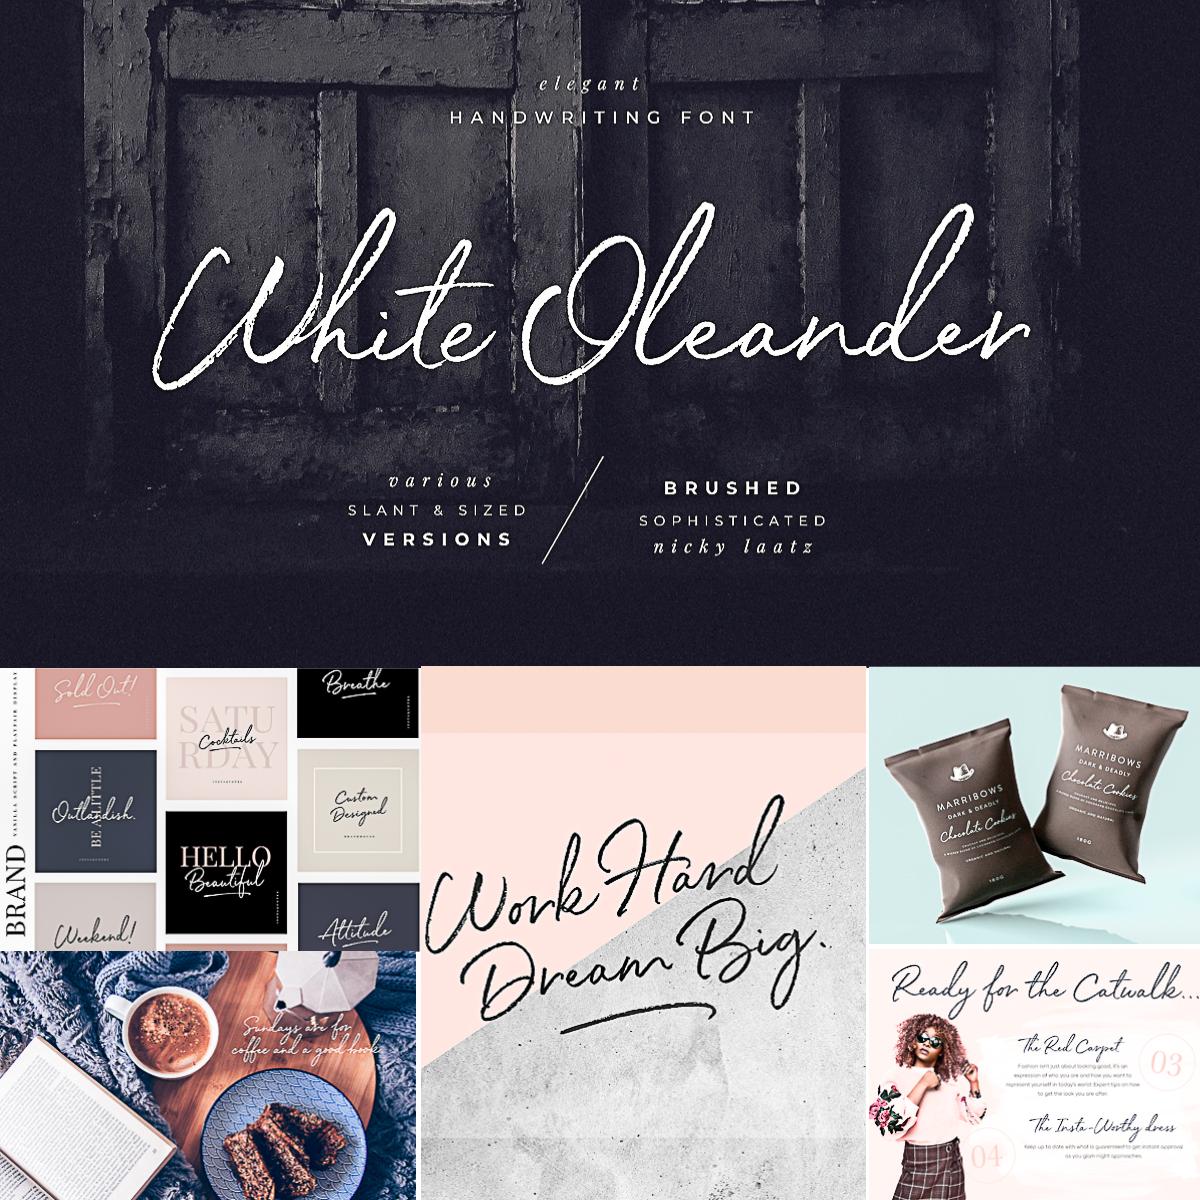 White Oleander手写笔触纹理签名英文字体下载